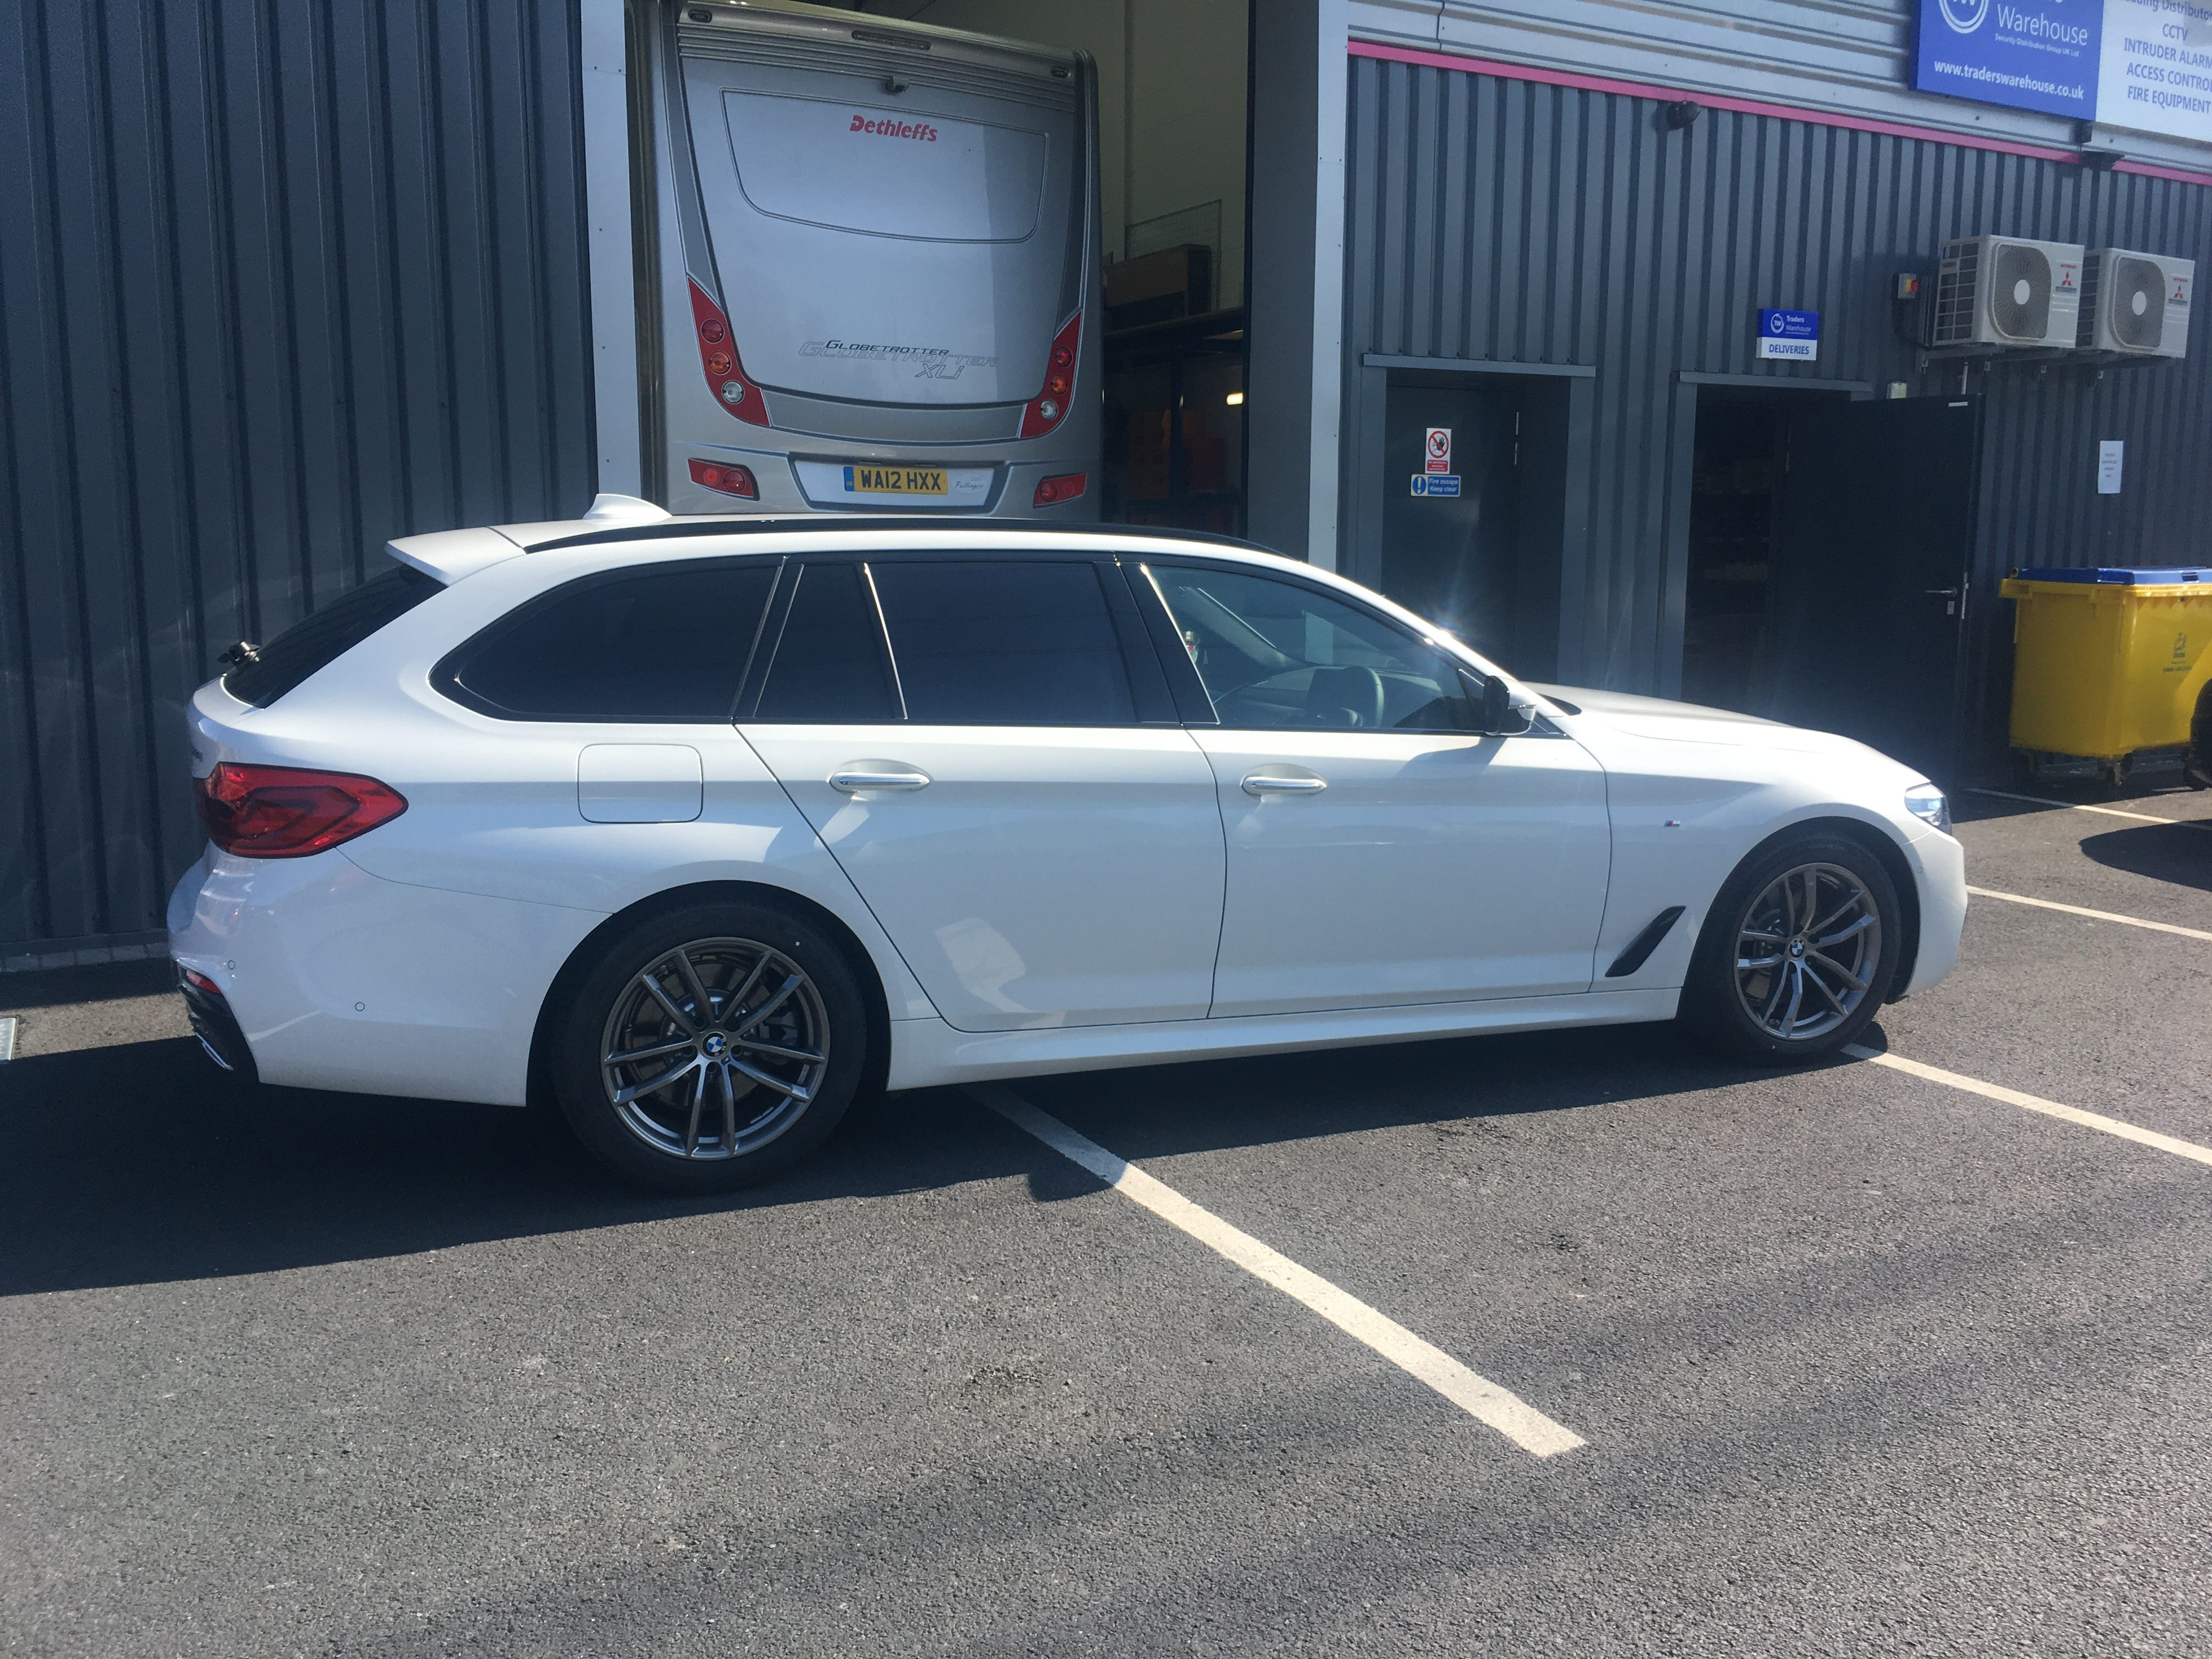 BMW 5 SERIES DIESEL TOURING 520d M Sport 5dr Auto Car Leasing Best Offers